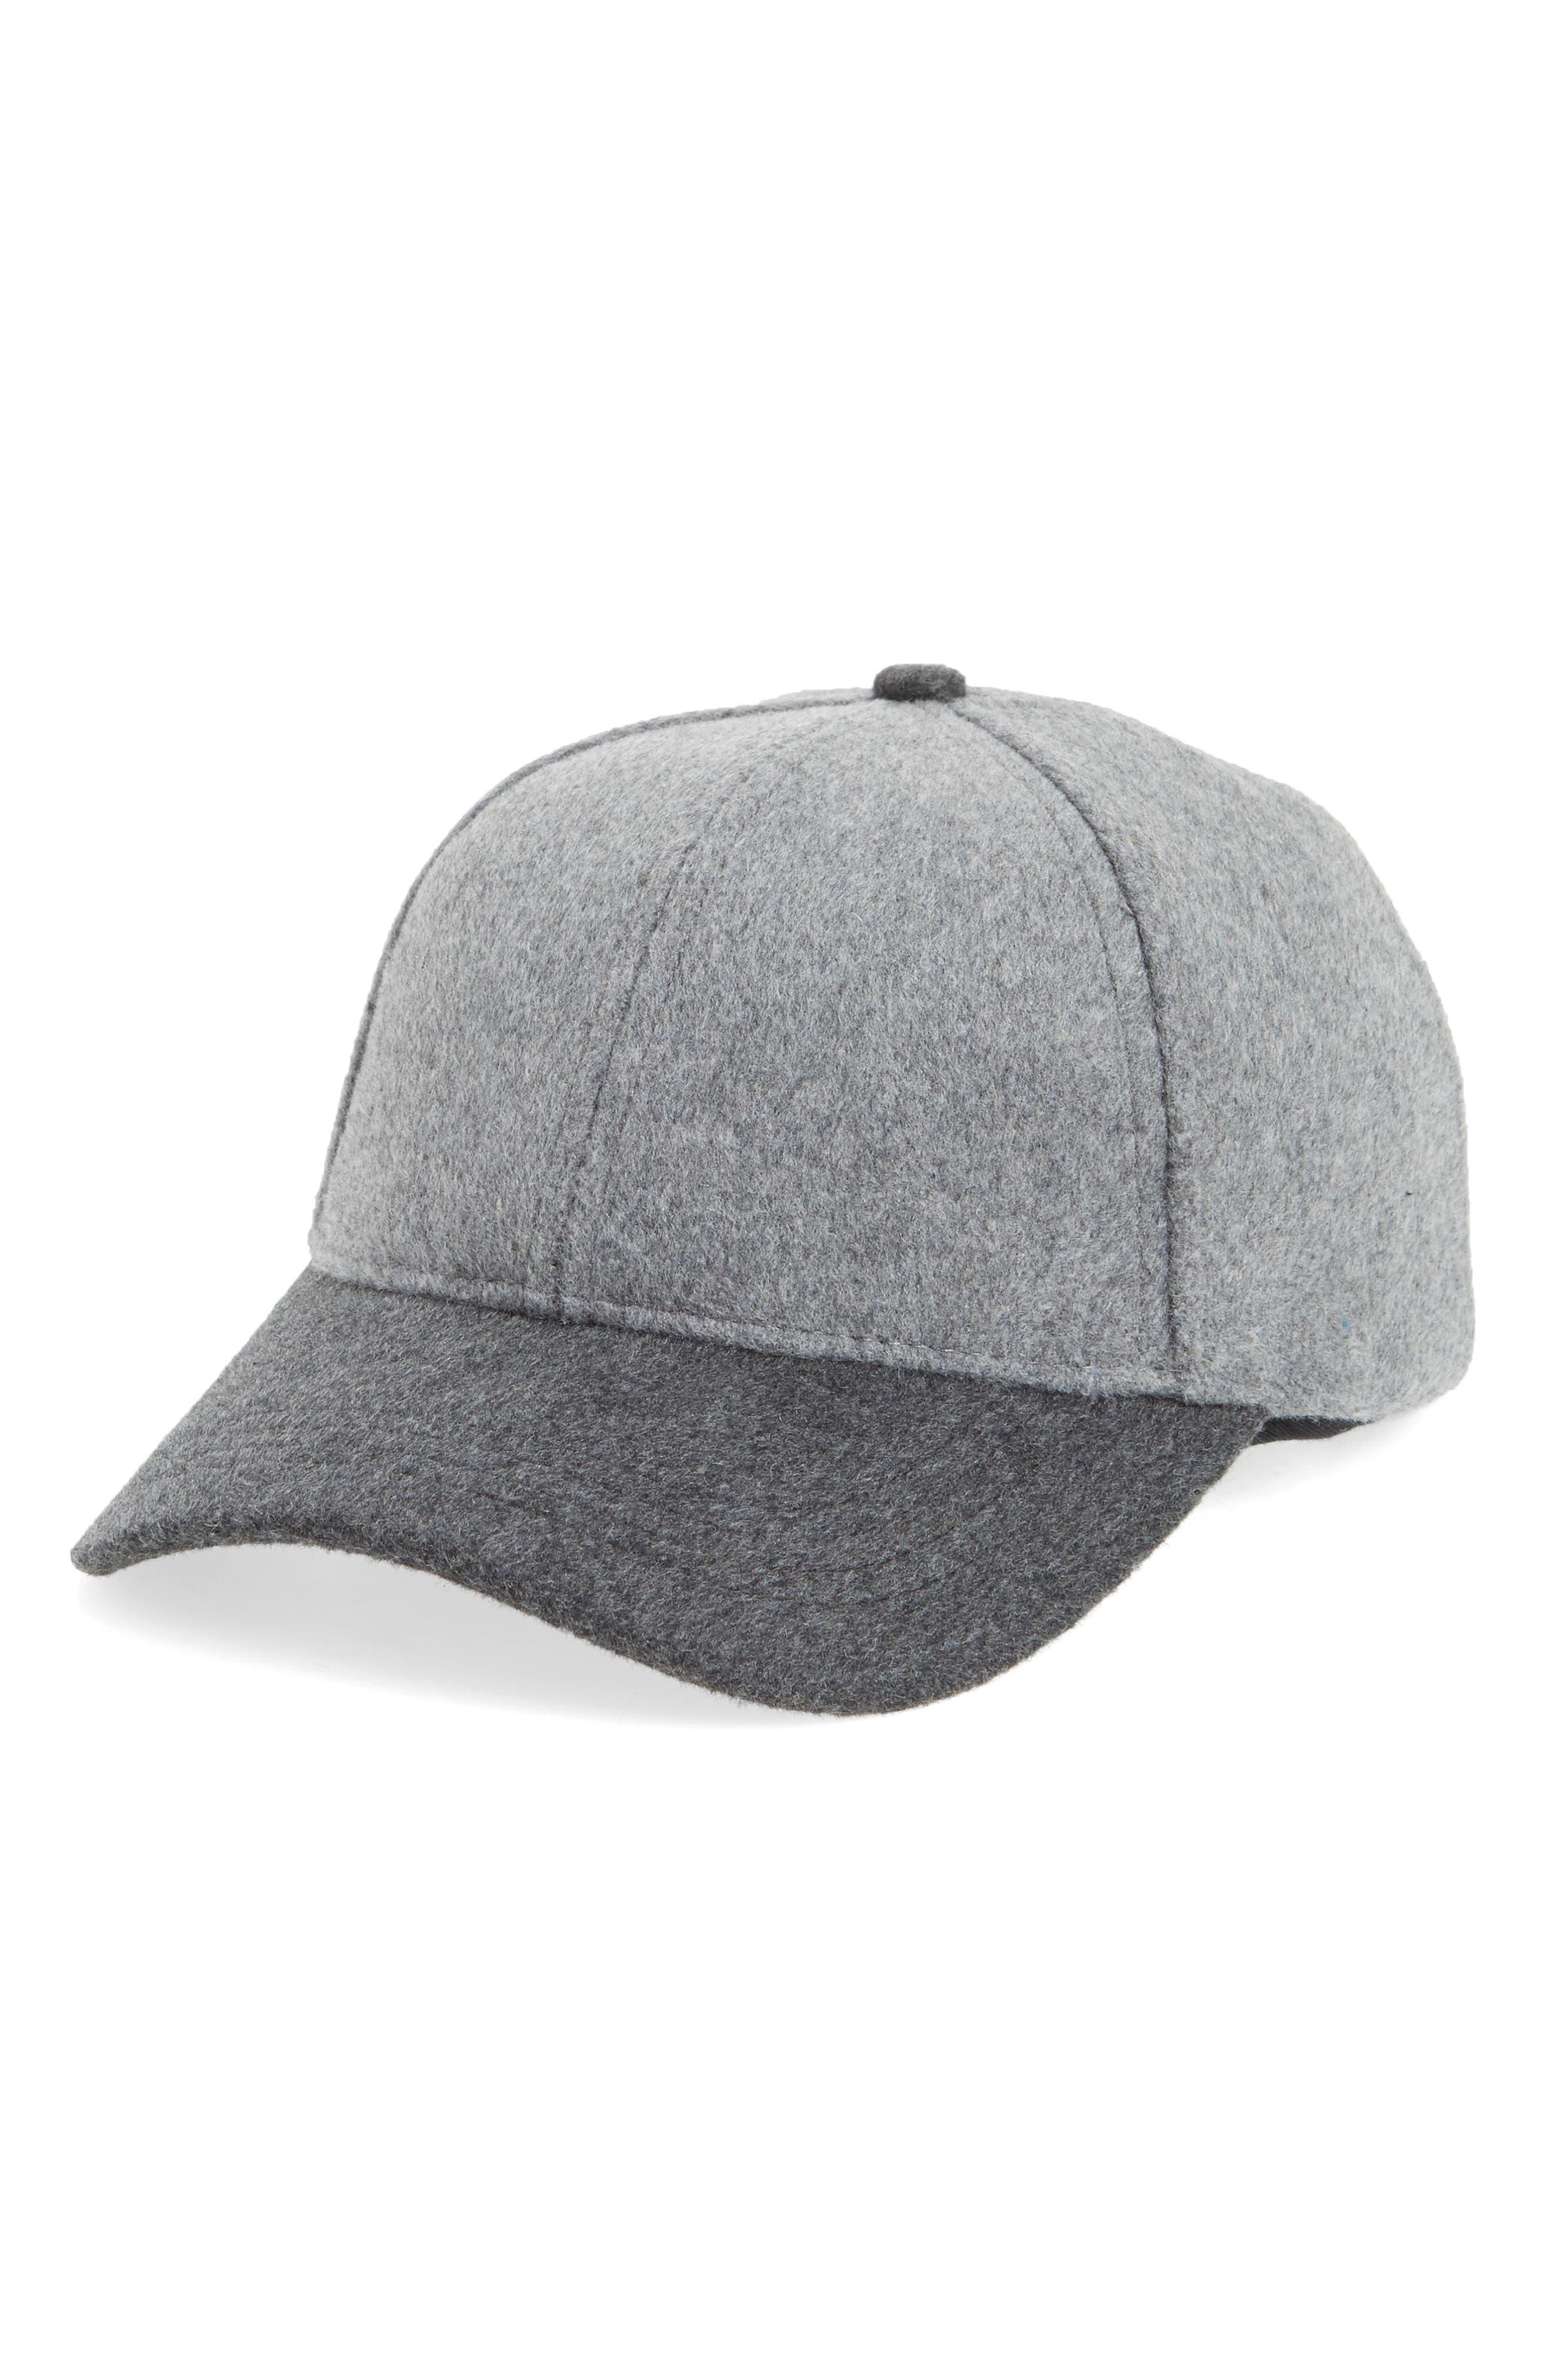 Two-Tone Baseball Cap,                         Main,                         color, 020